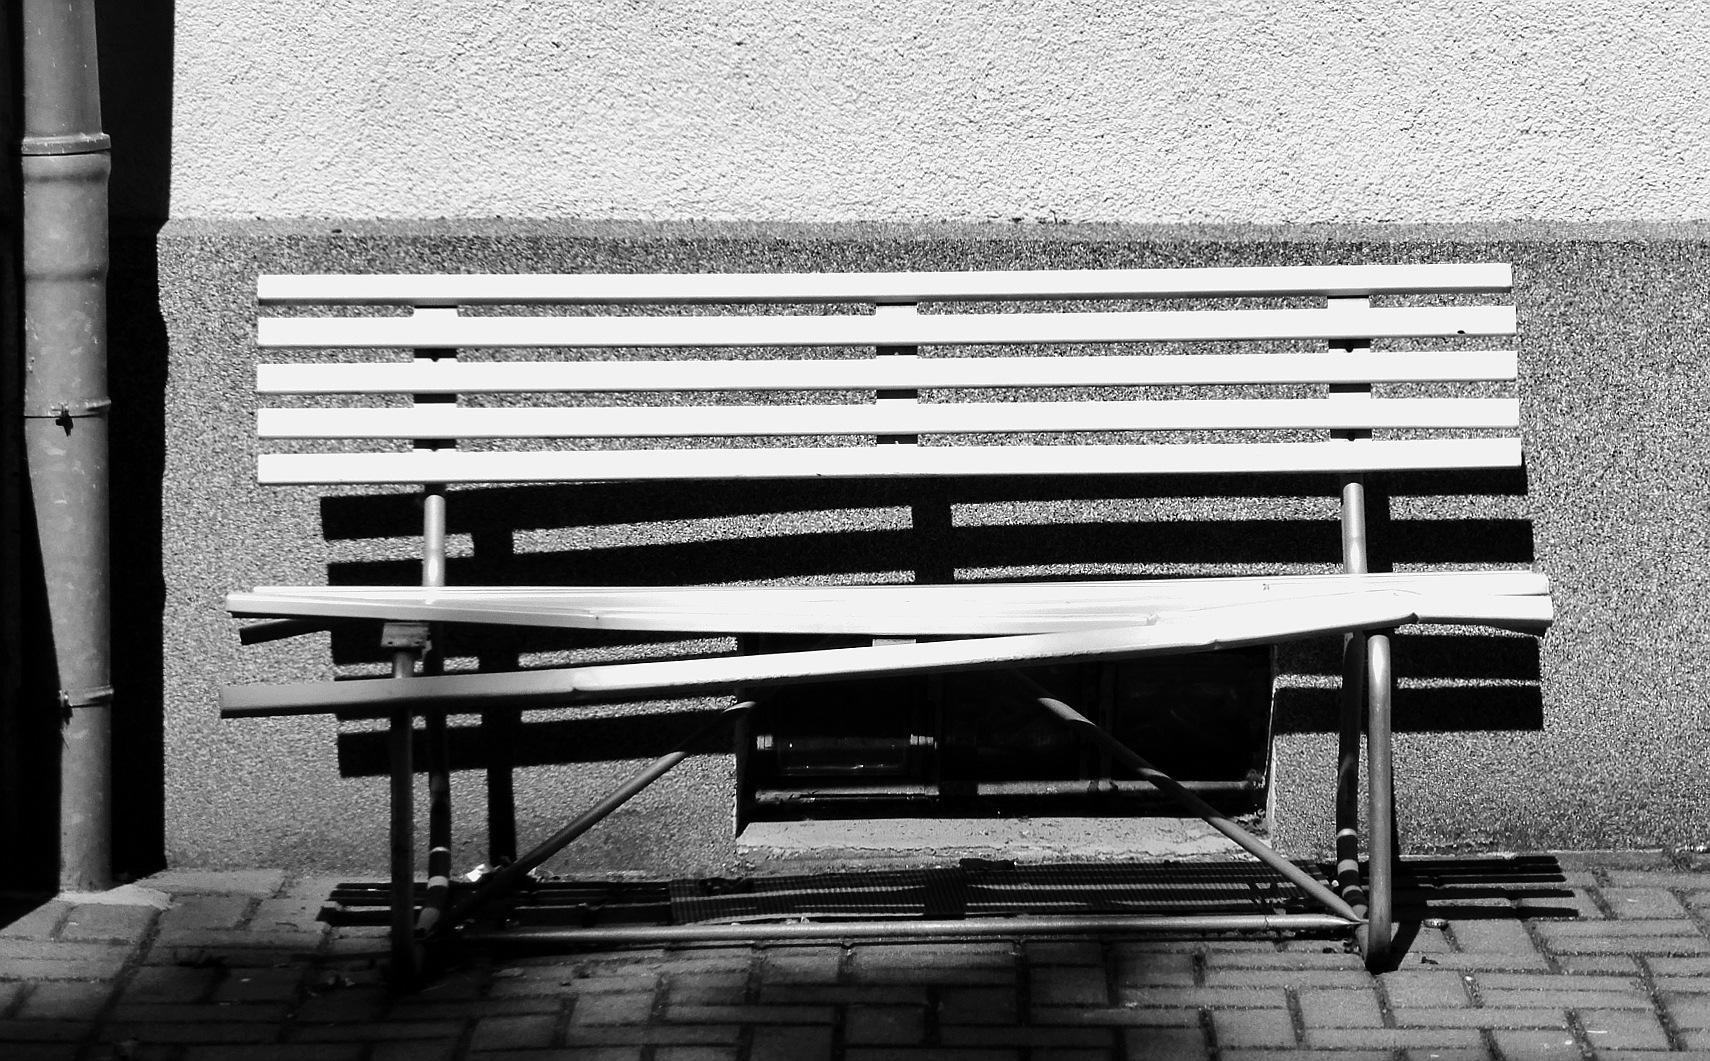 Broken bench by Gernot Schwarz